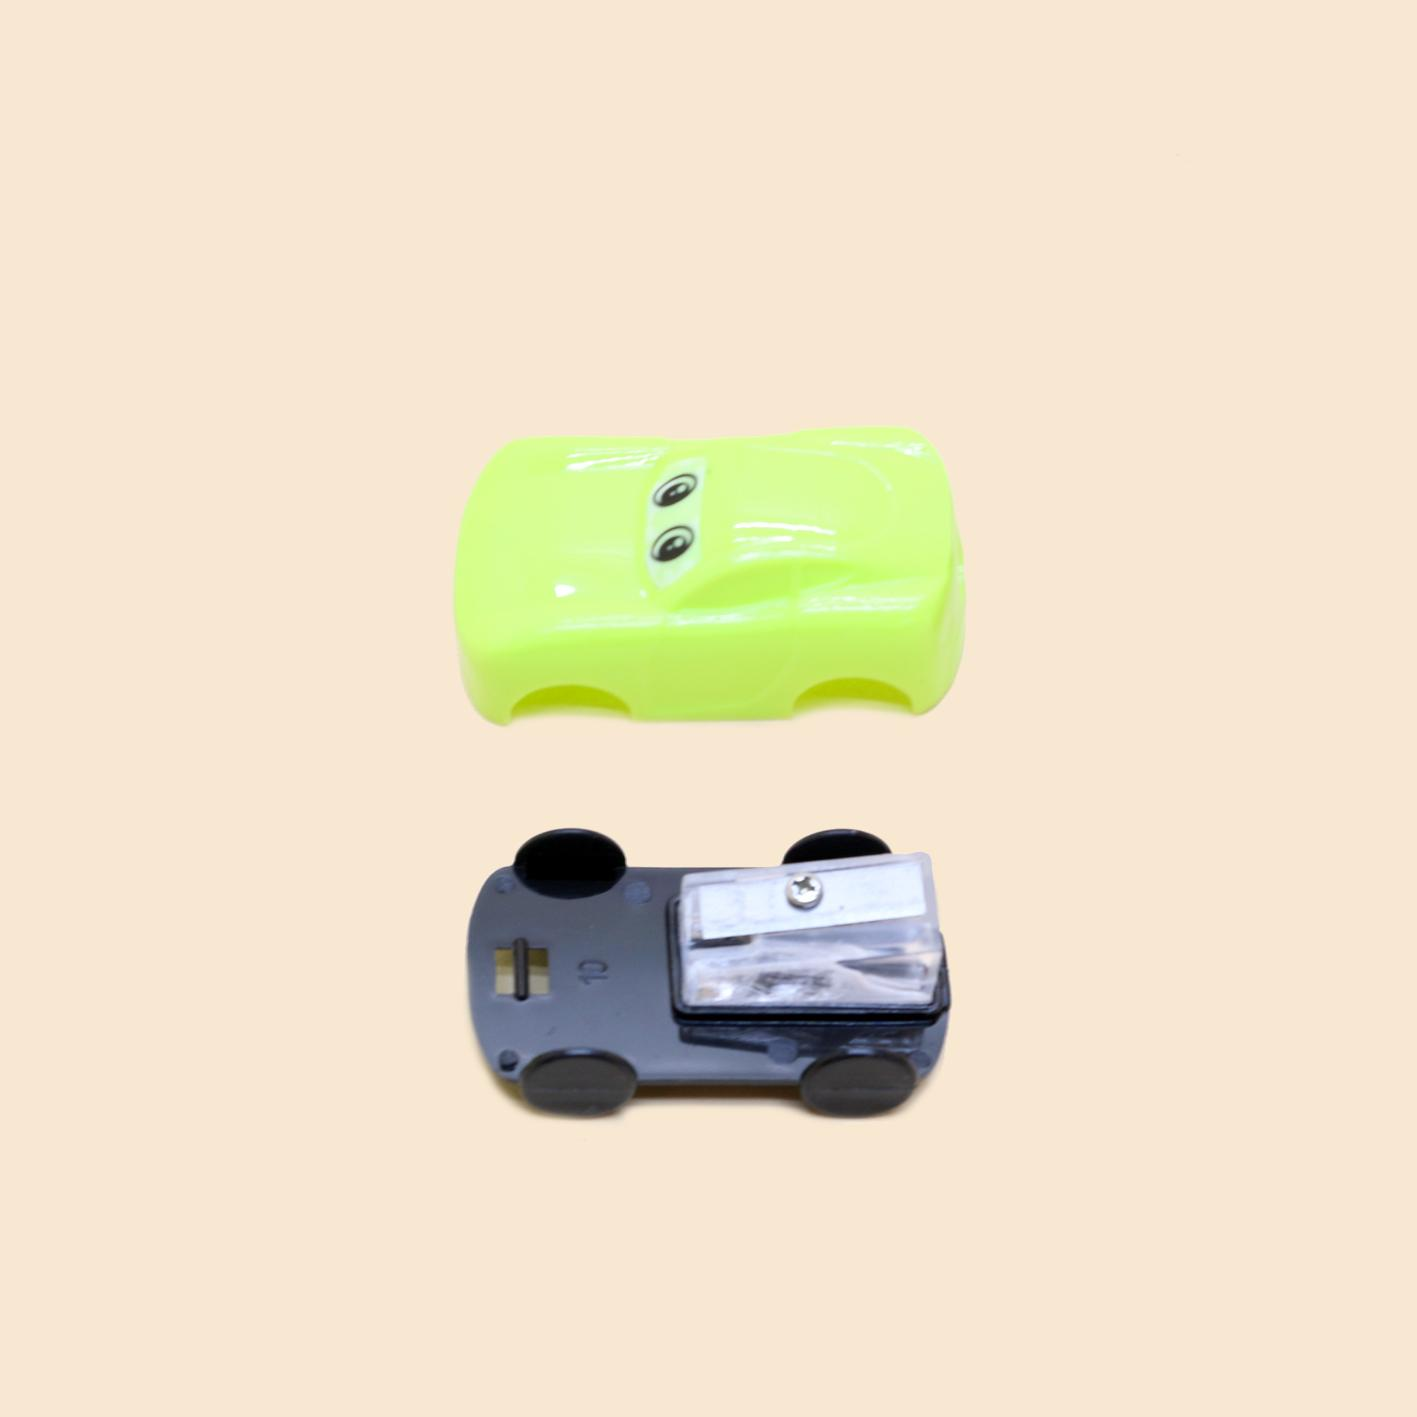 Chuốt chì xe hơi - Car pencil sharpener